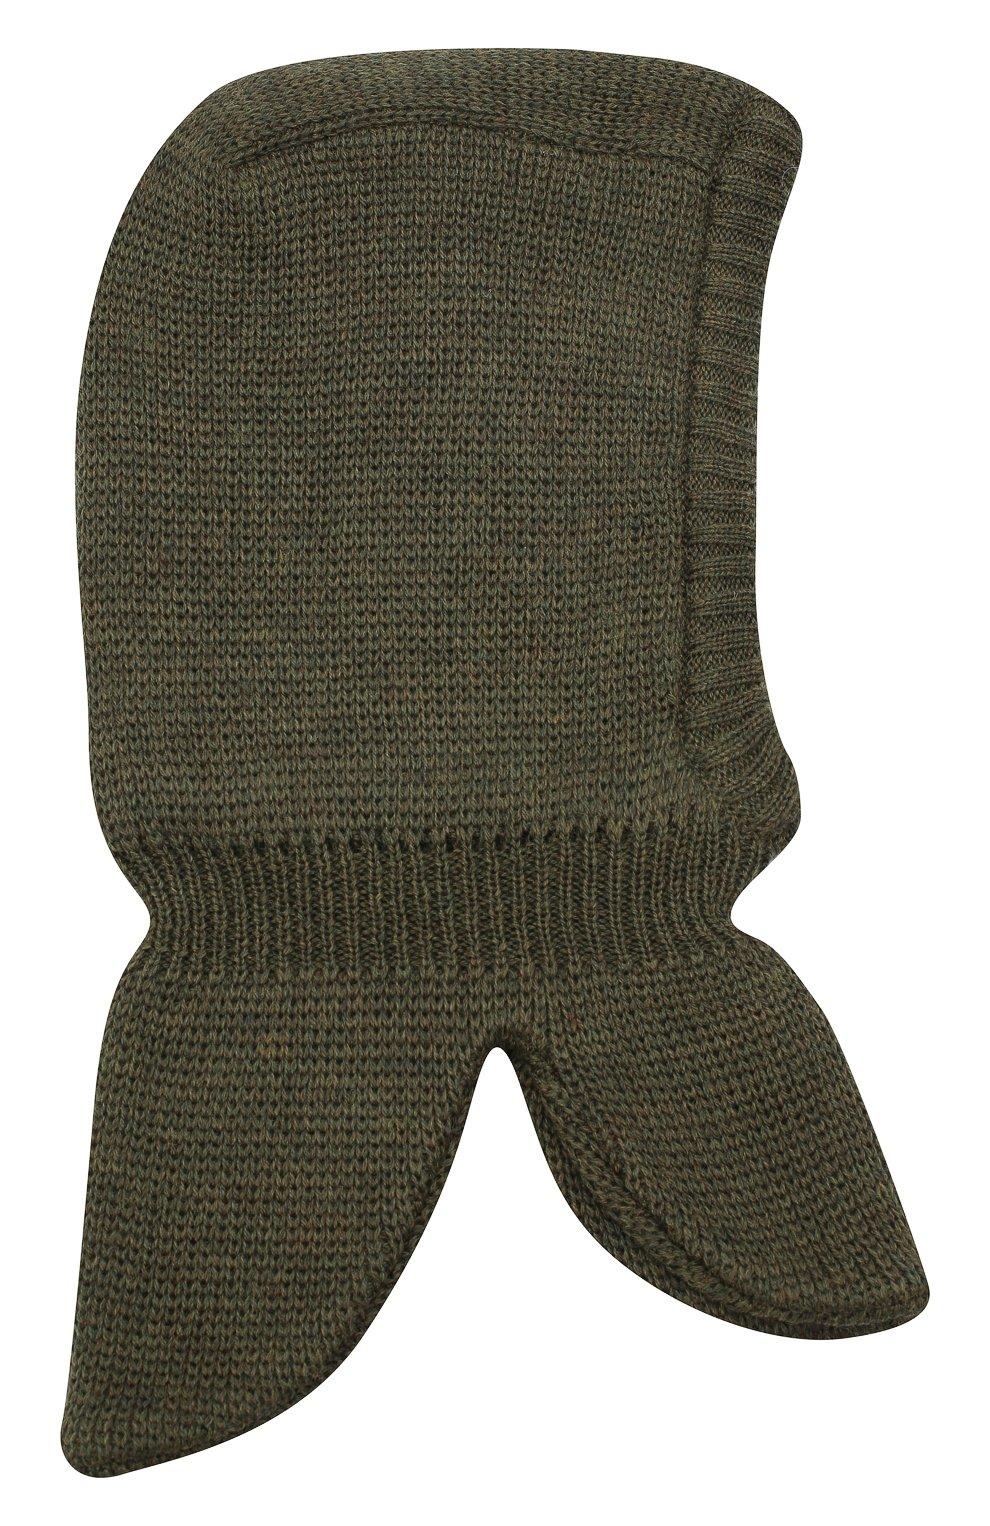 Детского шерстяная шапка-балаклава IL TRENINO хаки цвета, арт. 20 4065/E3 | Фото 2 (Материал: Шерсть)